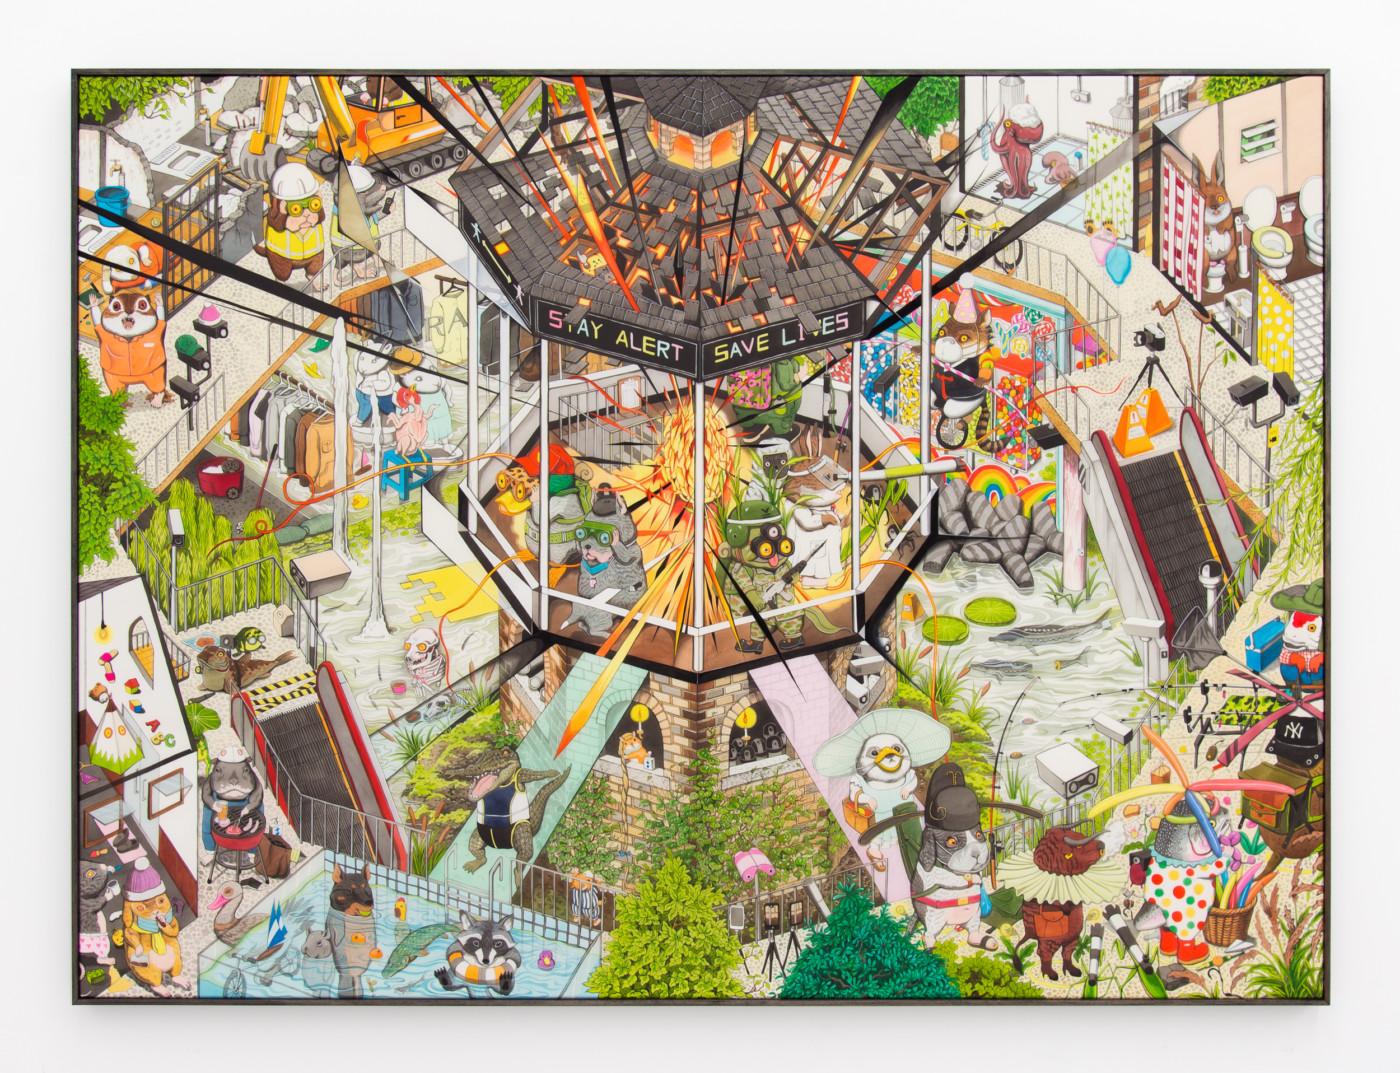 HUN KYU KIM Alert Save Lies, 2020 Pigment painted on silk 102 x 136 cm / 40 1/8 x 53 1/2 in - High Art Gallery Paris